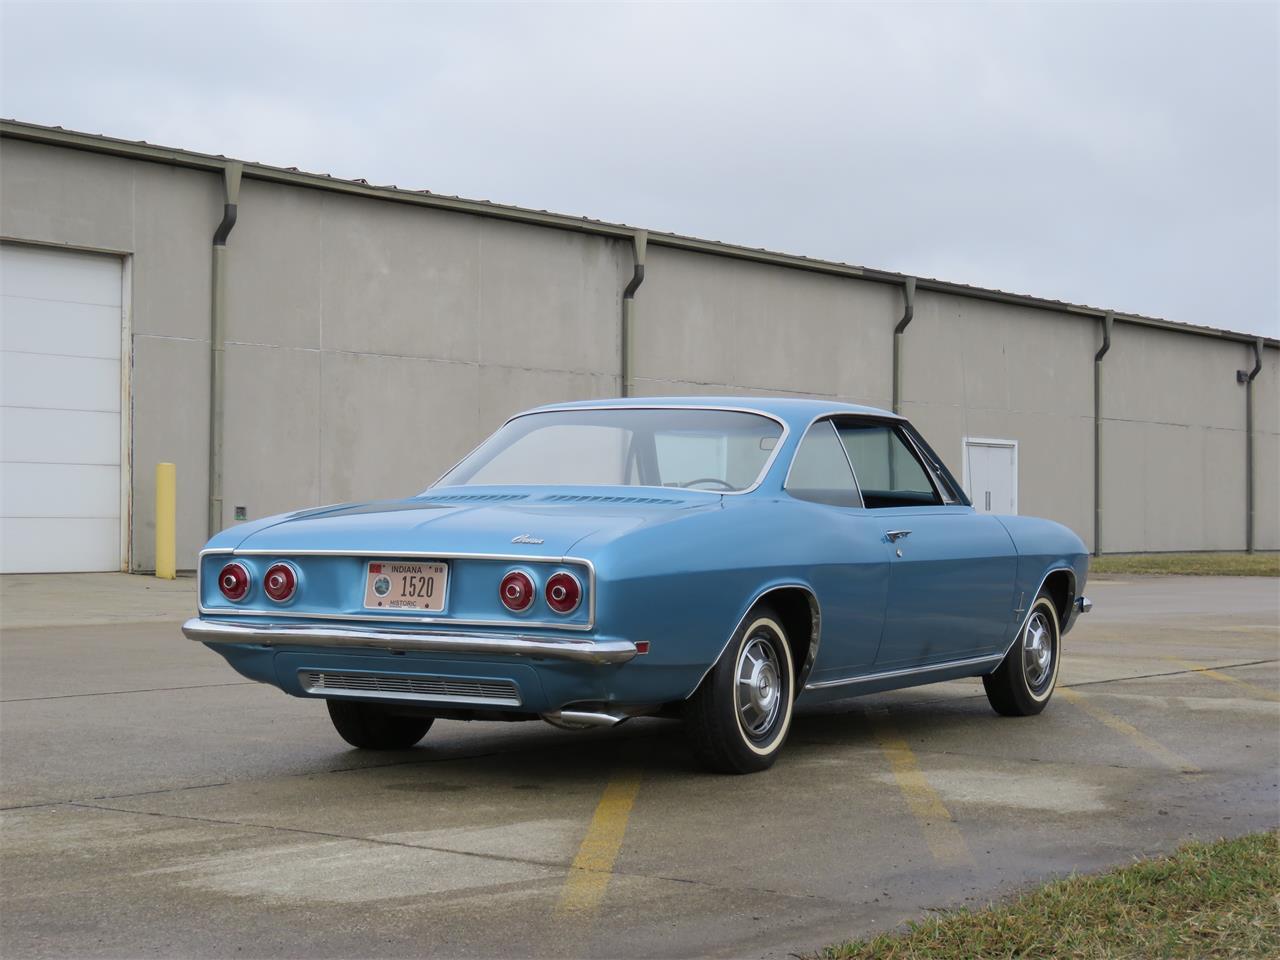 Kokomo Car Dealers >> 1968 Chevrolet Corvair Monza for Sale | ClassicCars.com ...